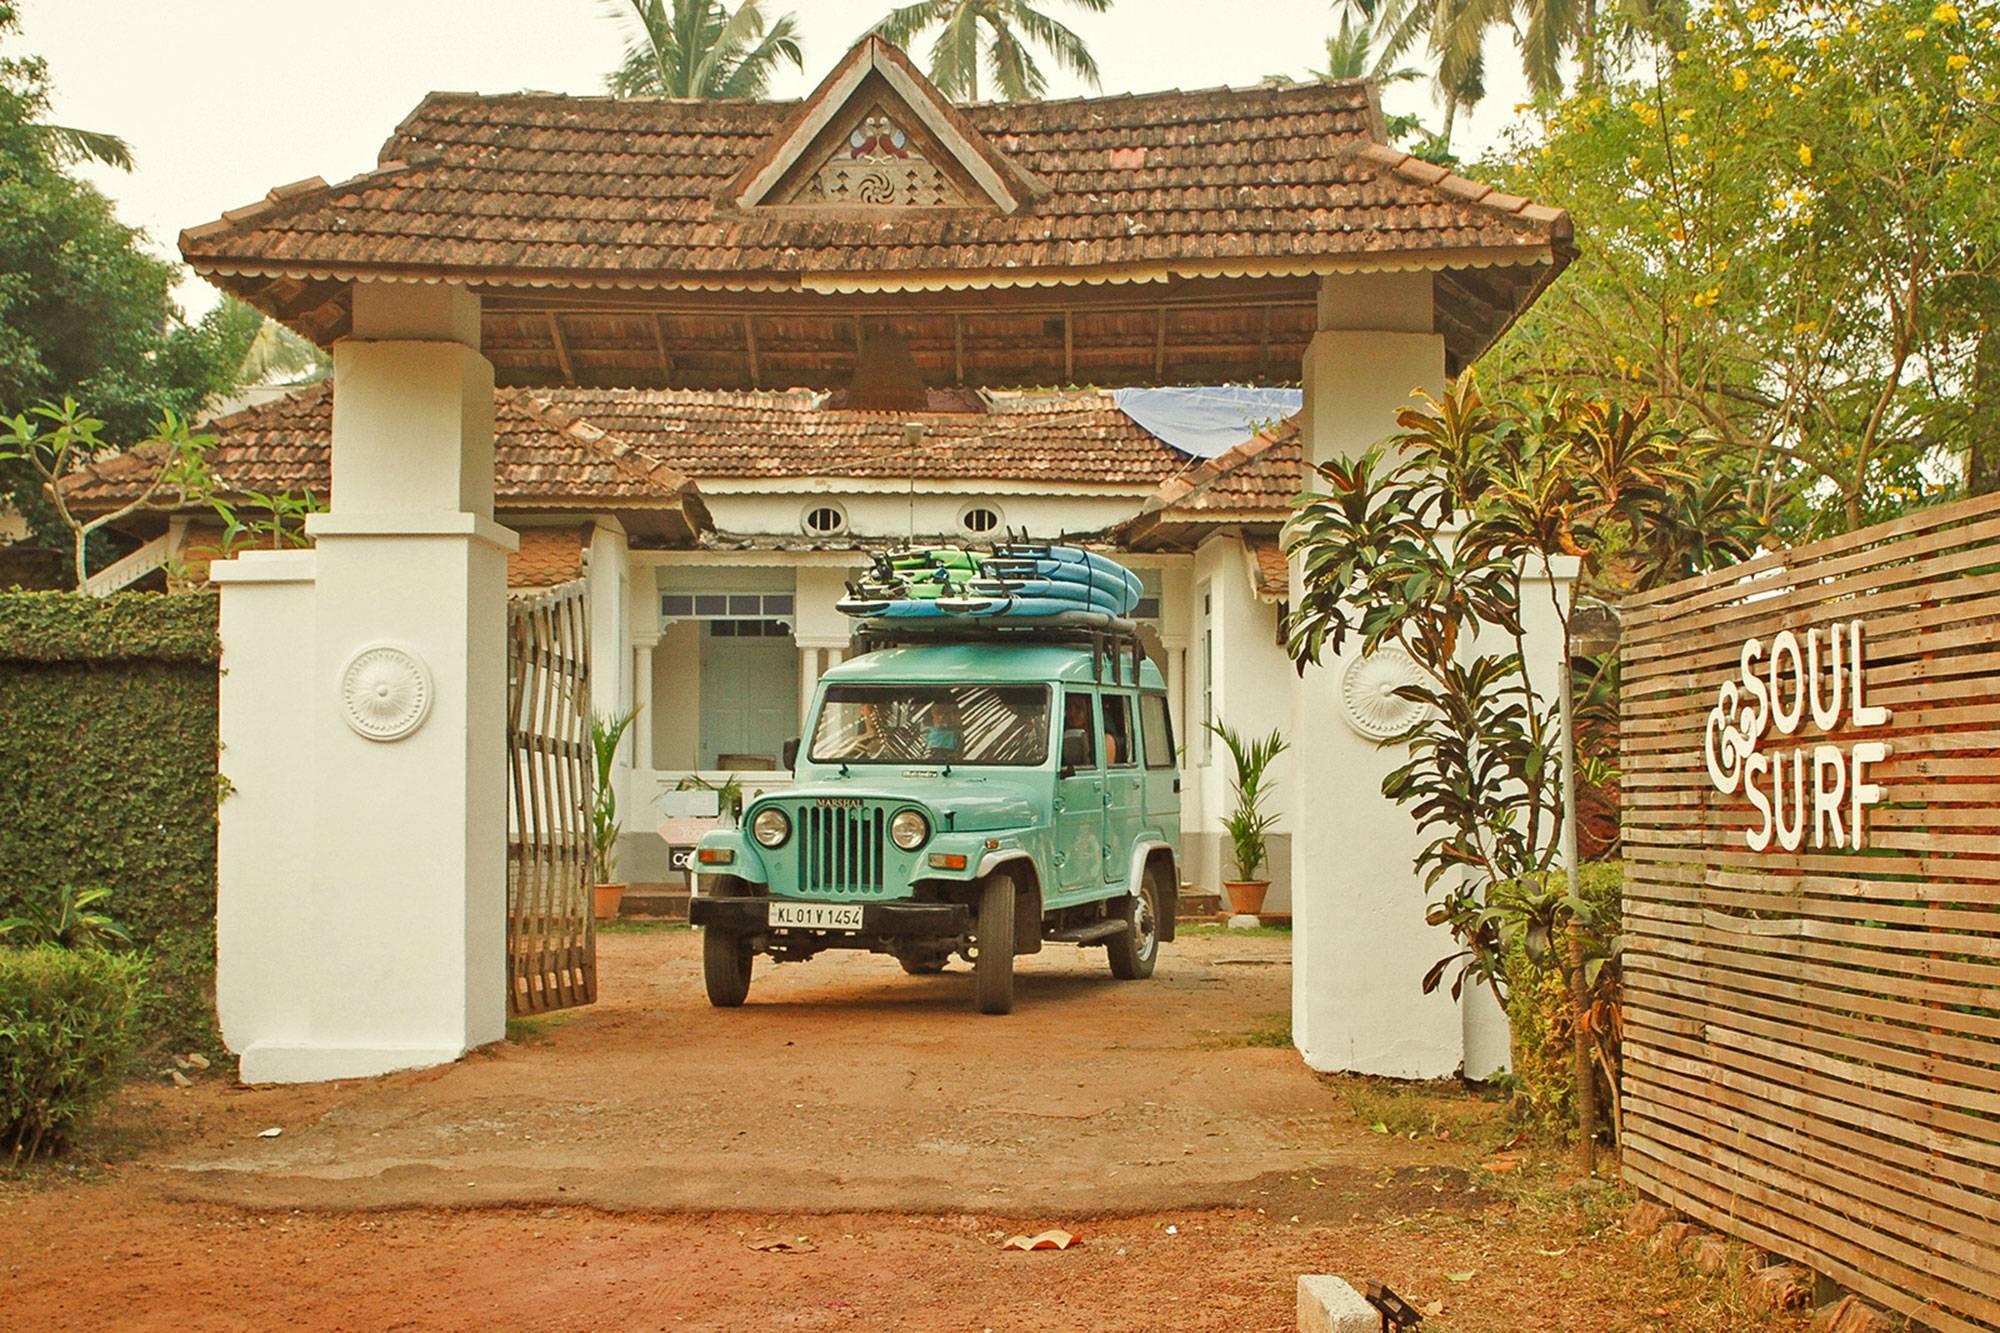 https://www.soulandsurf.com/wp-content/uploads/2021/09/Retreatsindia-images-Media-2-of-1.jpg